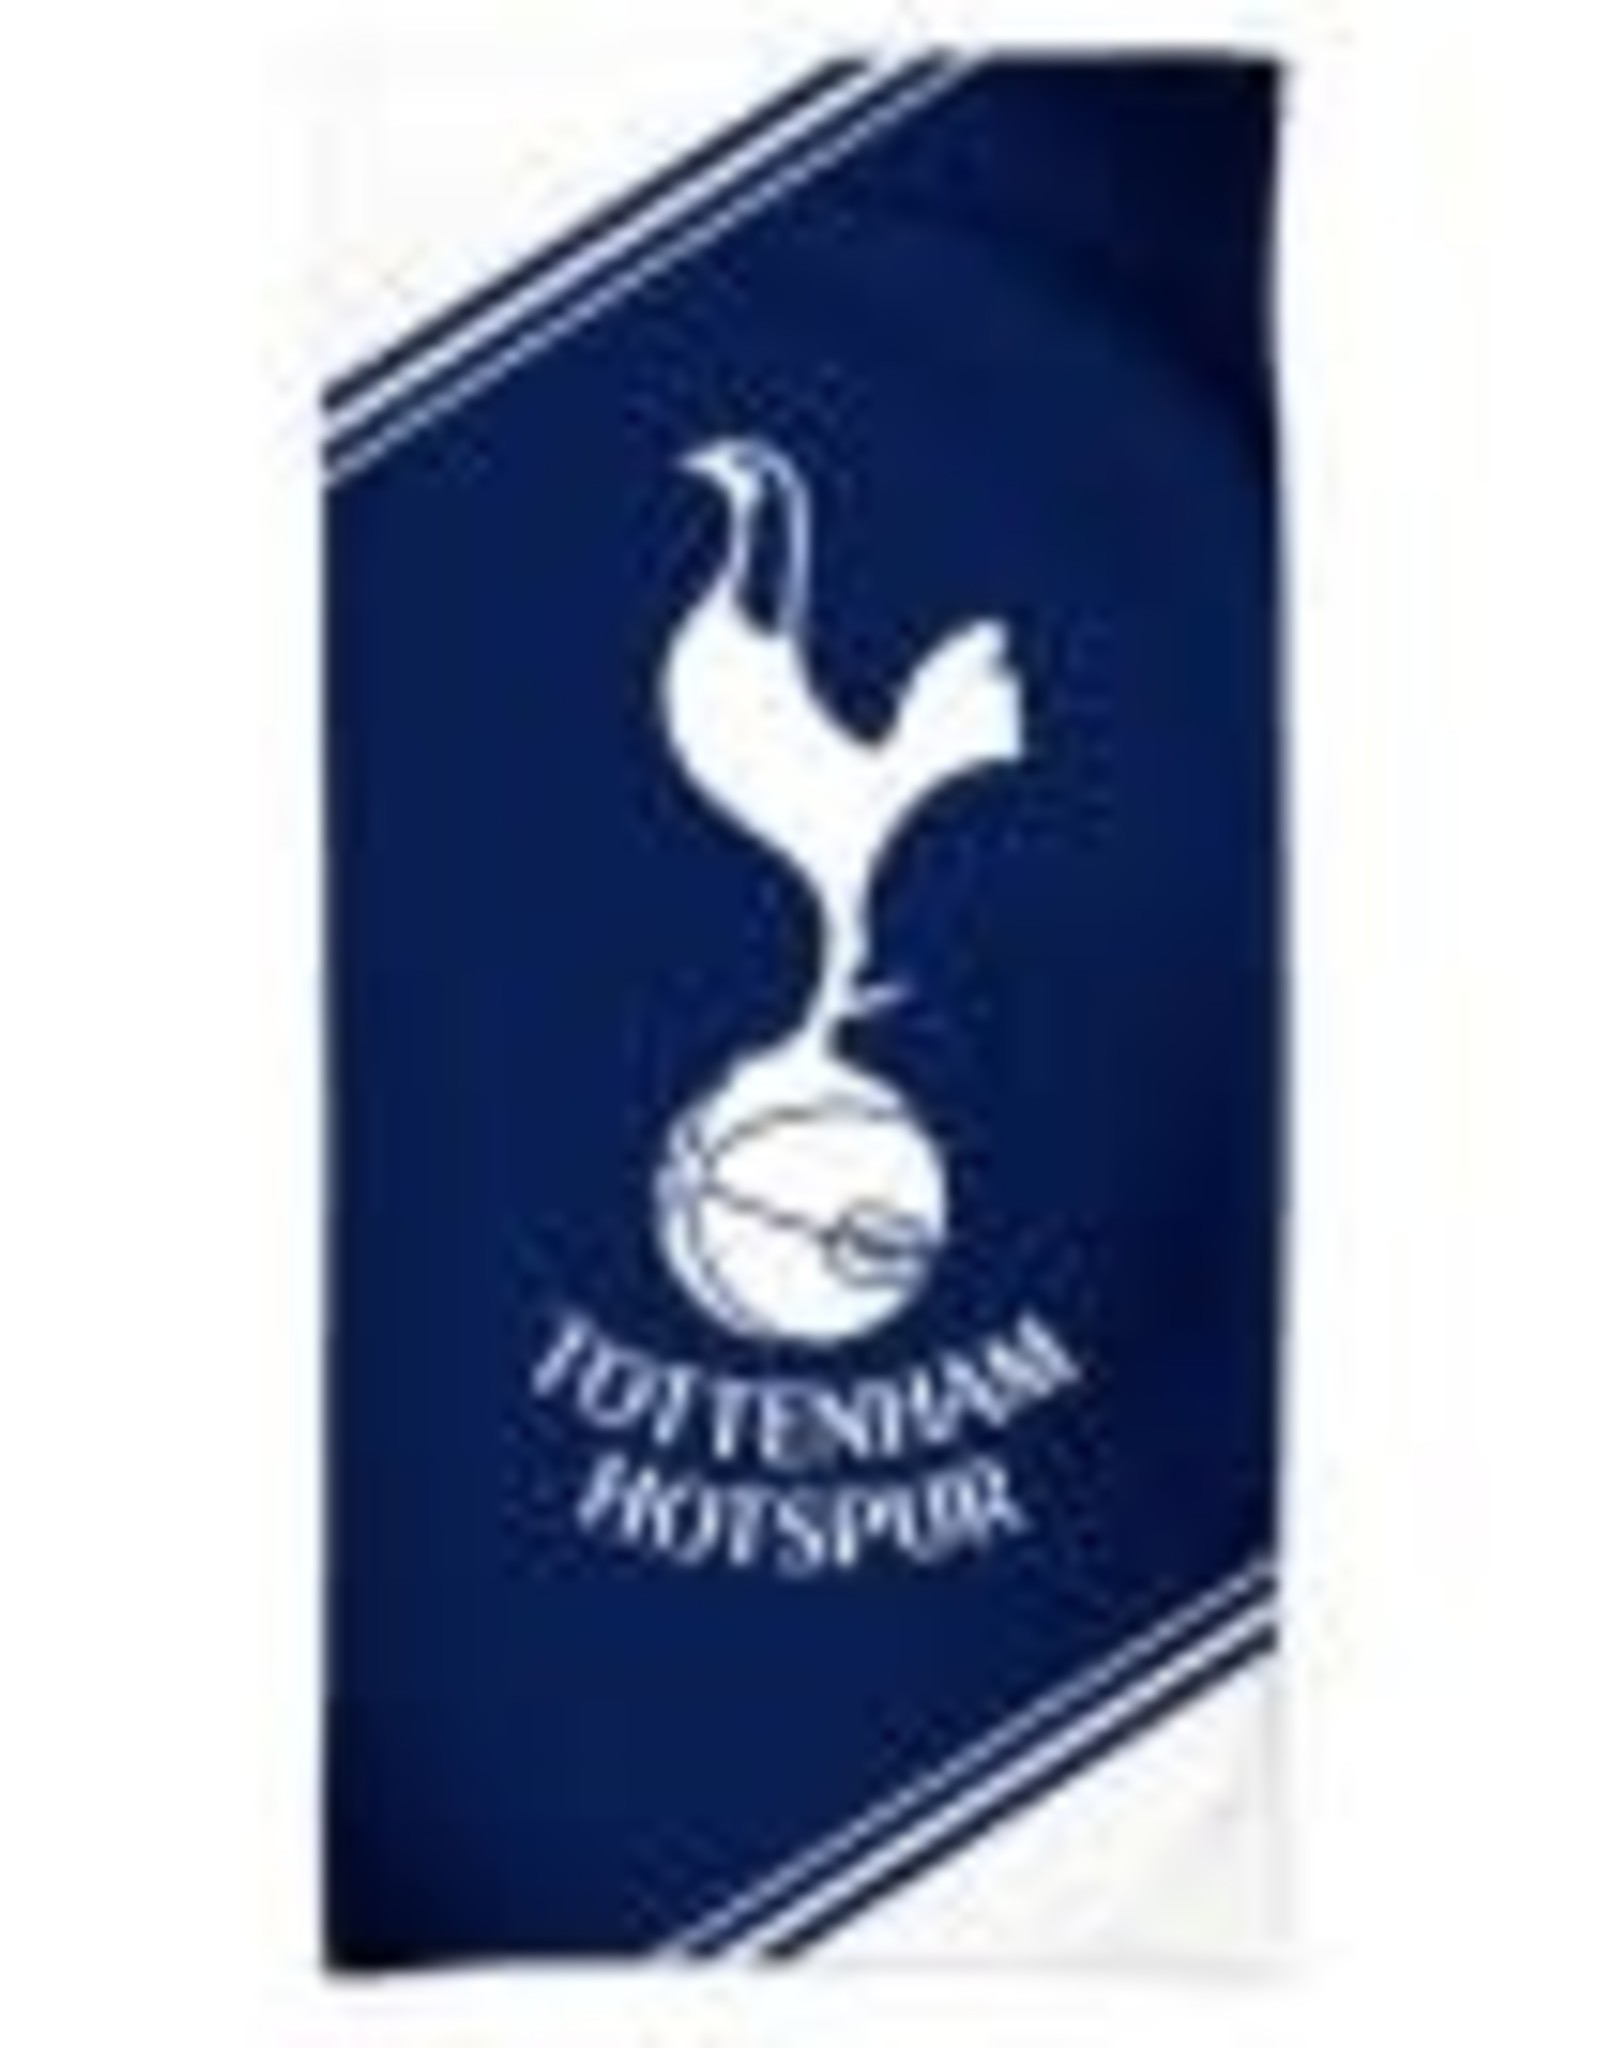 Tottenham Hotspur Spectra Beach Towel